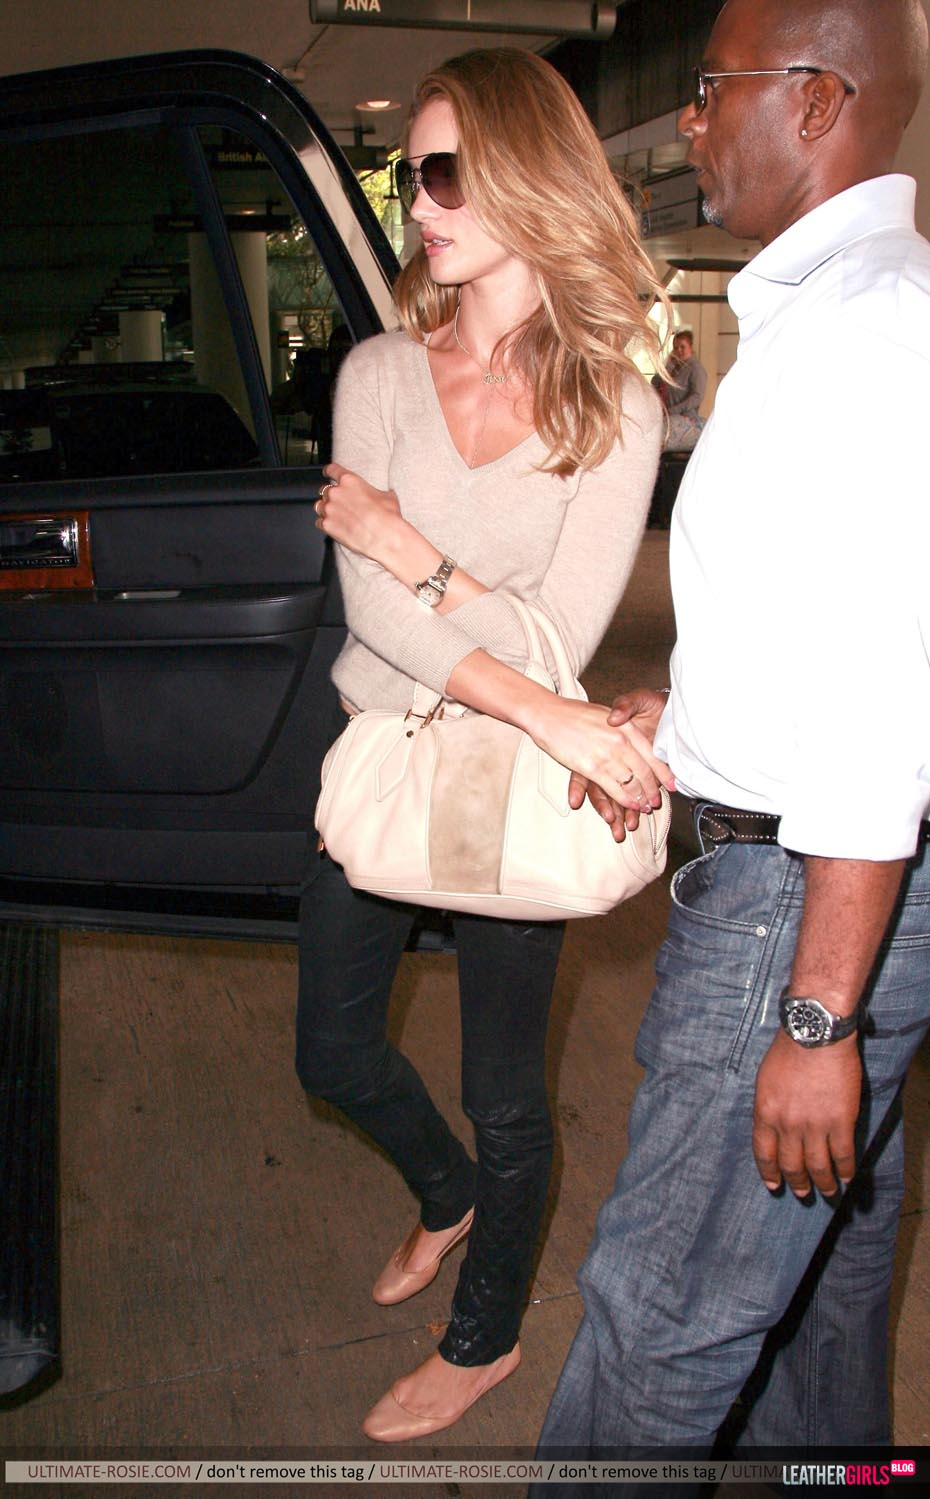 Rosie Huntington-Whiteley was spotted arriving back in LA leathergirlsblog-com- (16).jpg